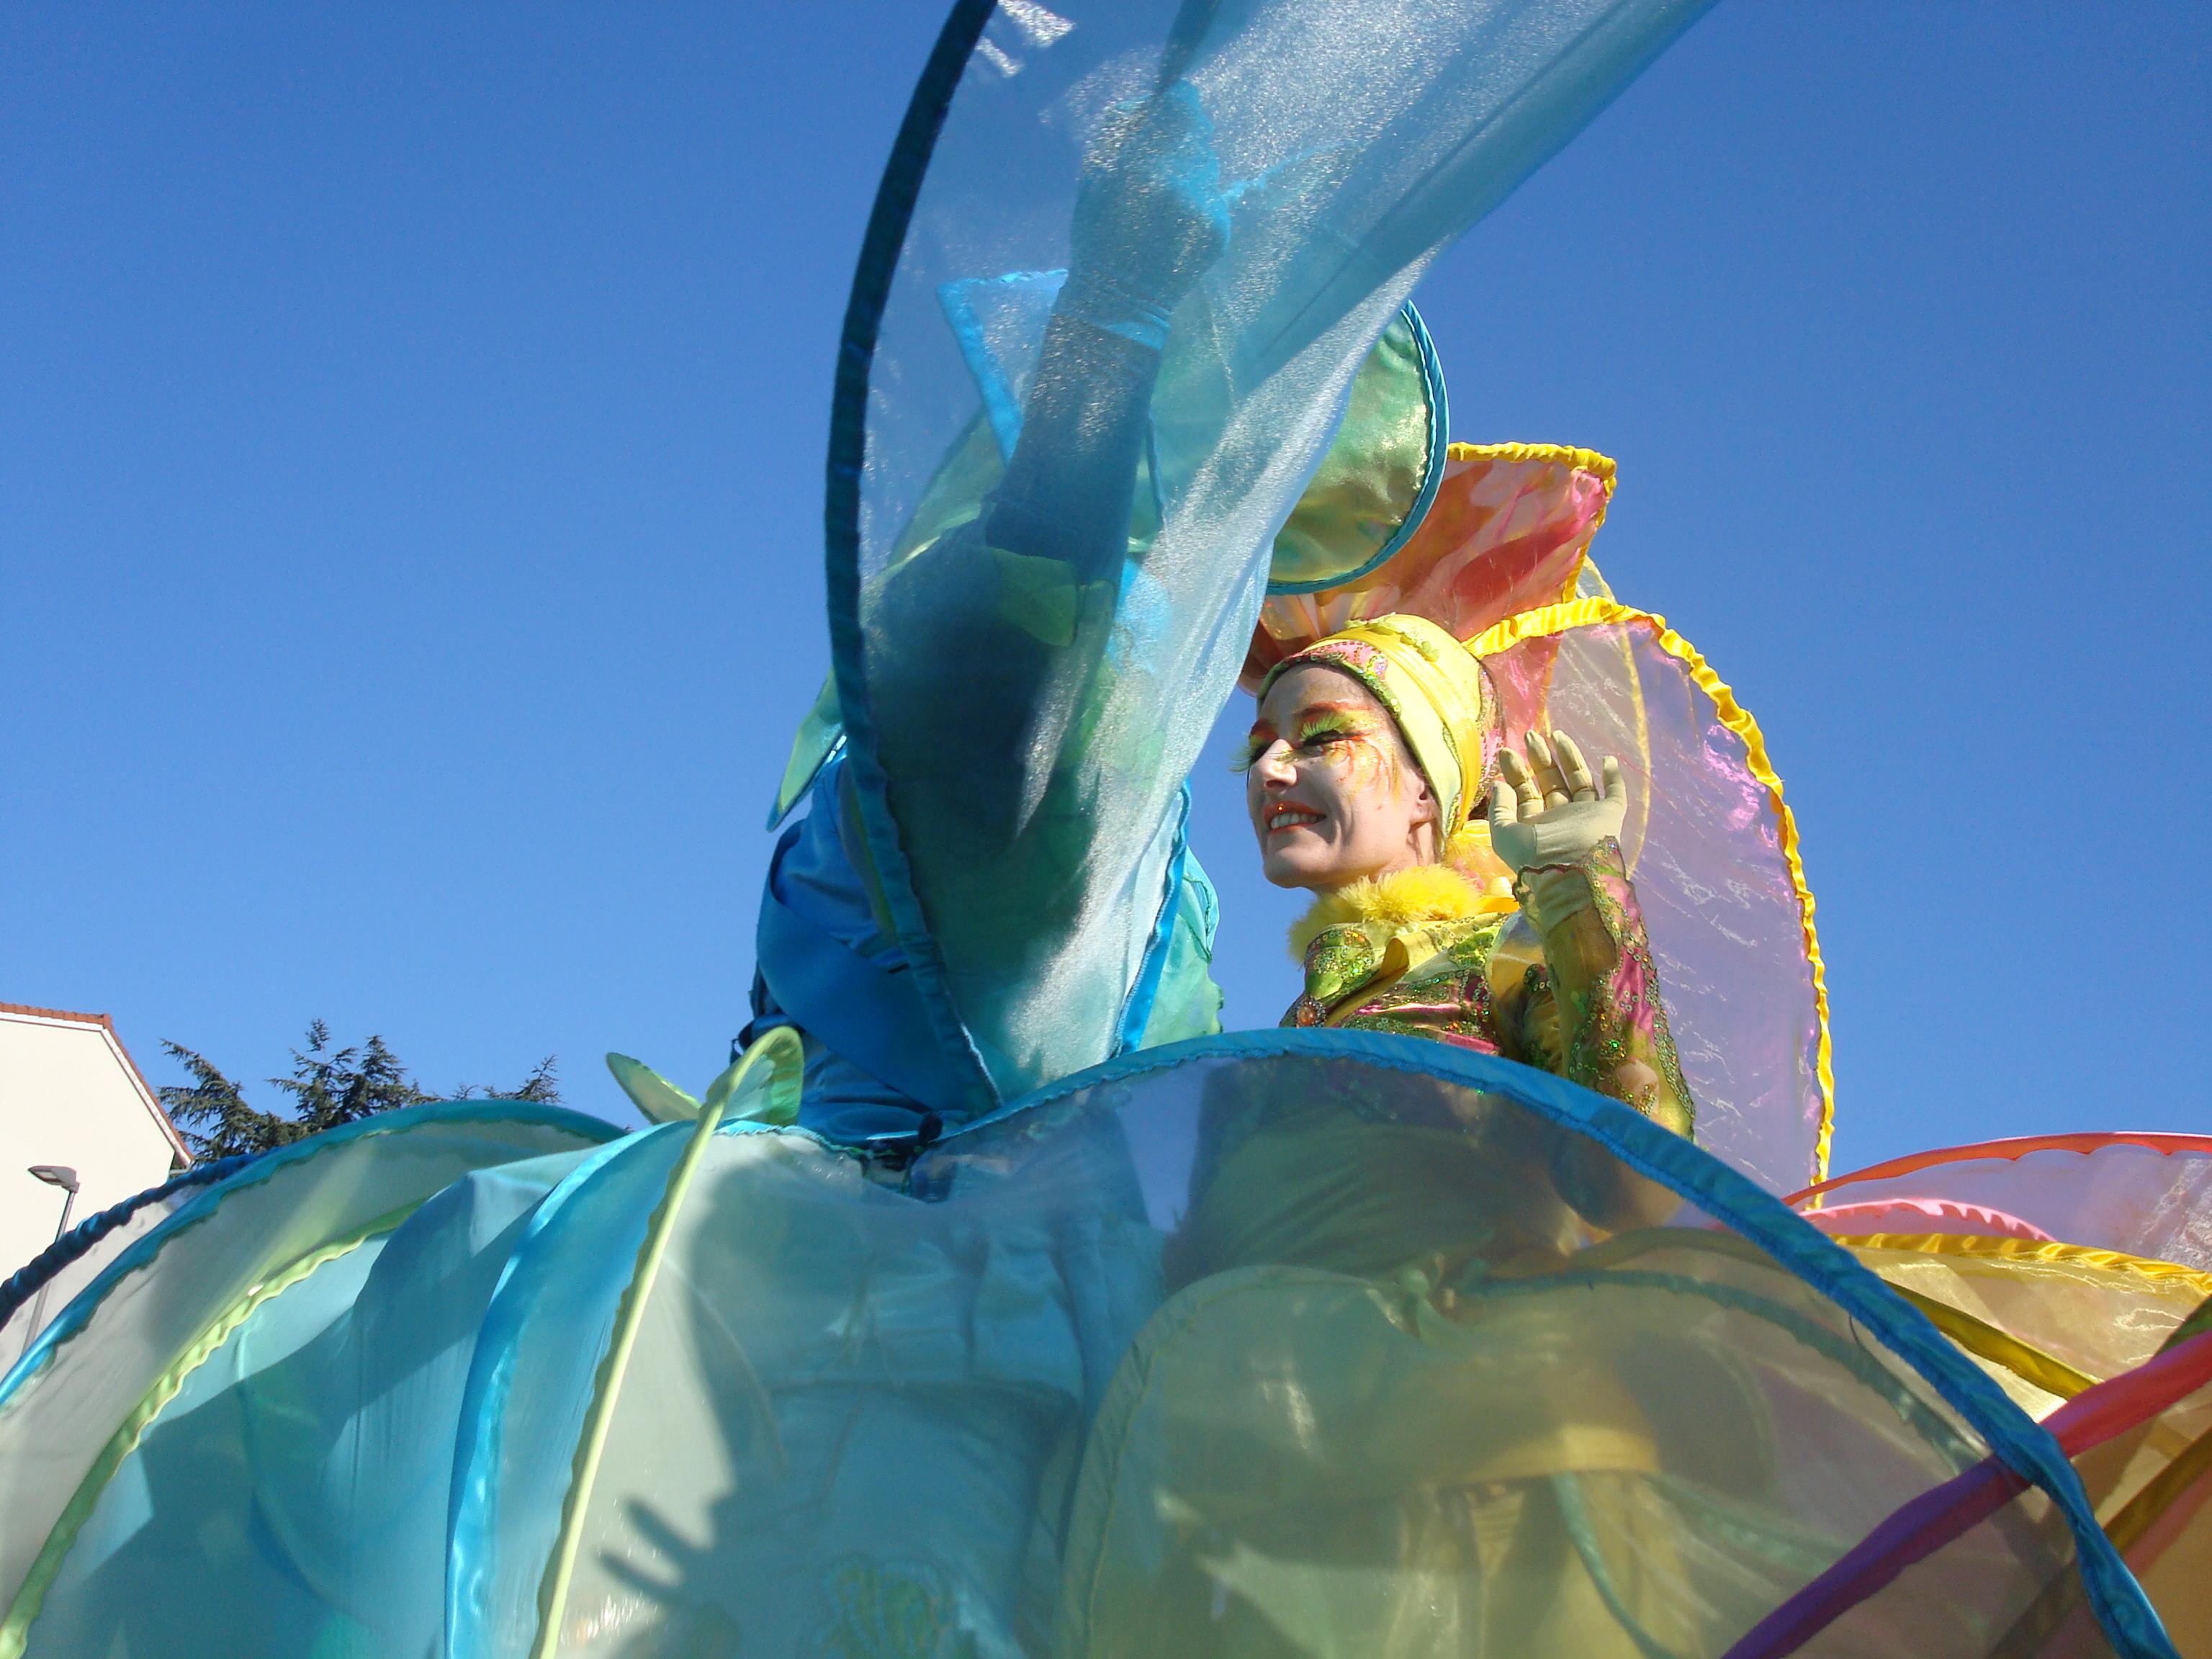 Carnaval 09 185 (101).jpg